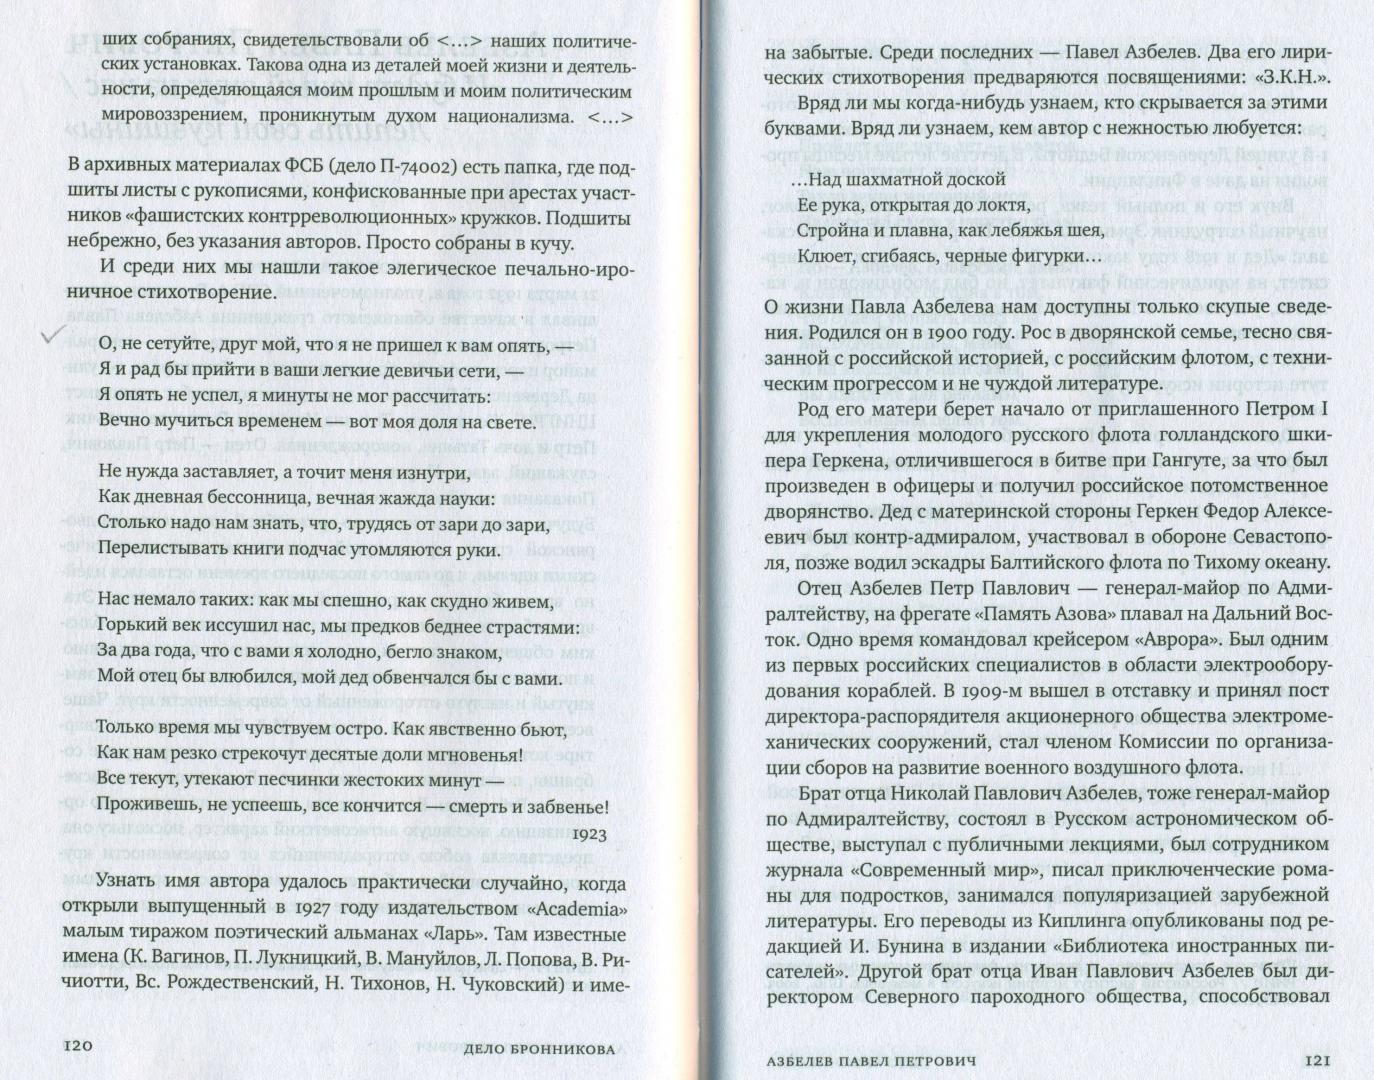 Иллюстрация 20 из 57 для Дело Бронникова - Громова, Позднякова, Вахтина | Лабиринт - книги. Источник: spl